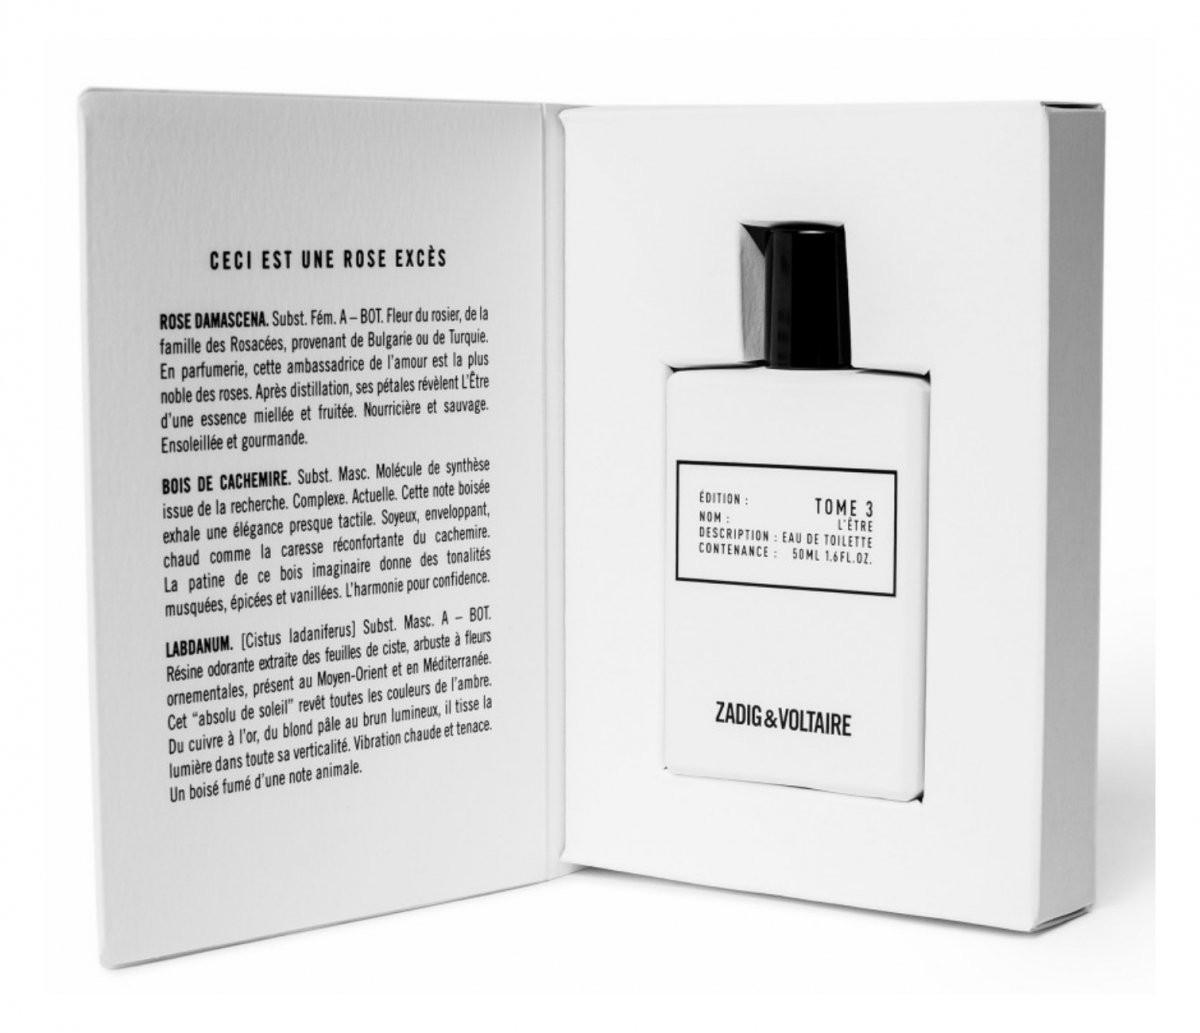 Zadig & Voltaire Tome 3 L'Etre аромат для мужчин и женщин